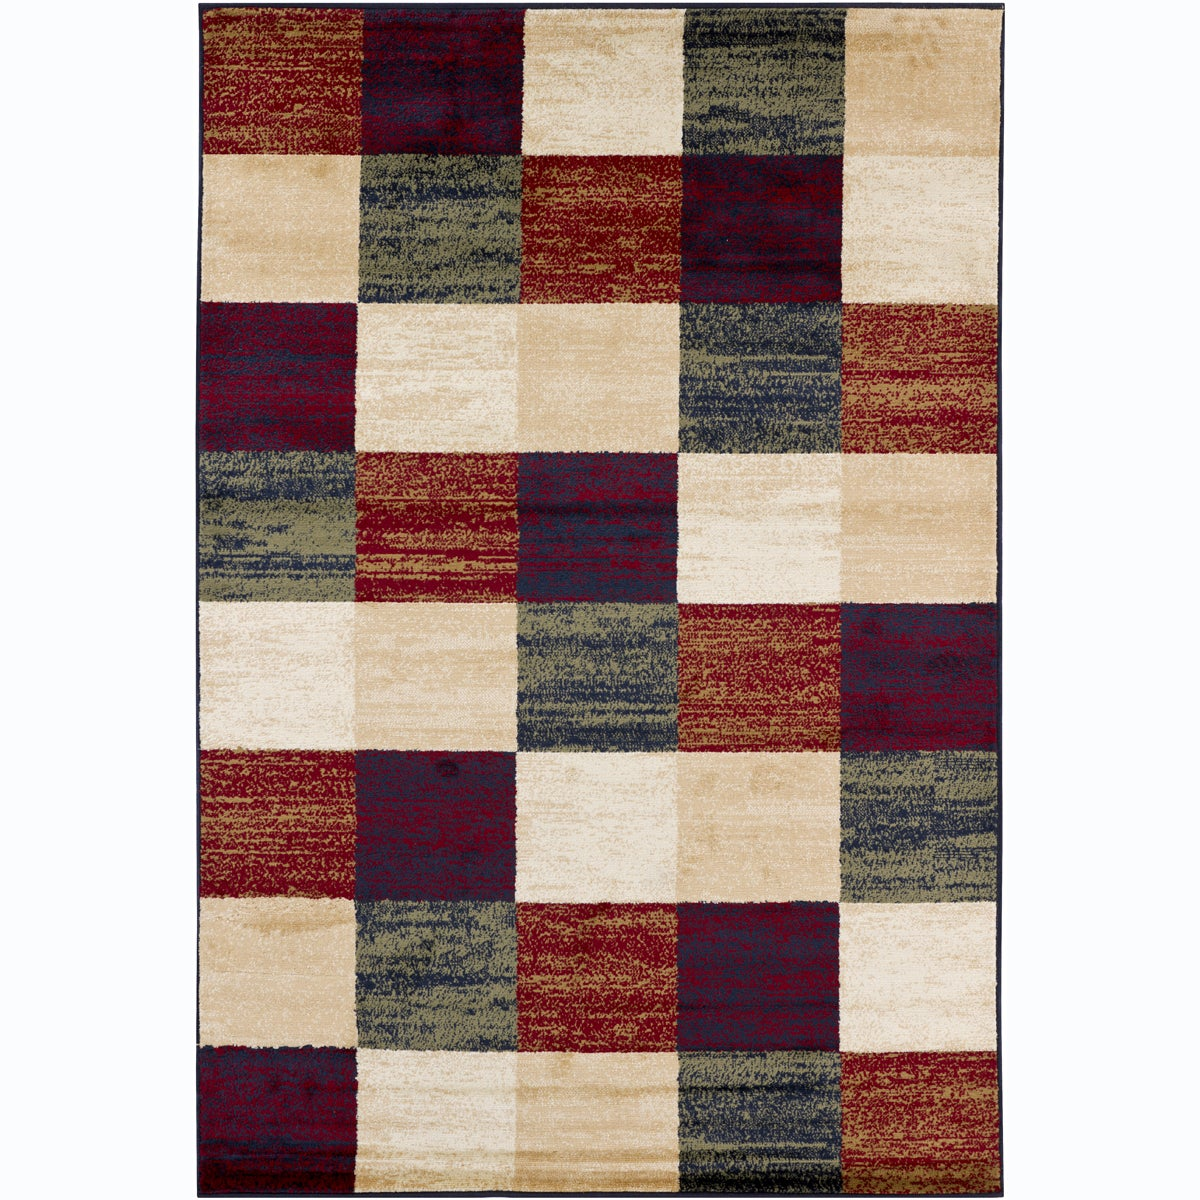 Artist's Loom Indoor Contemporary Geometric Rug - 8' x 11'2